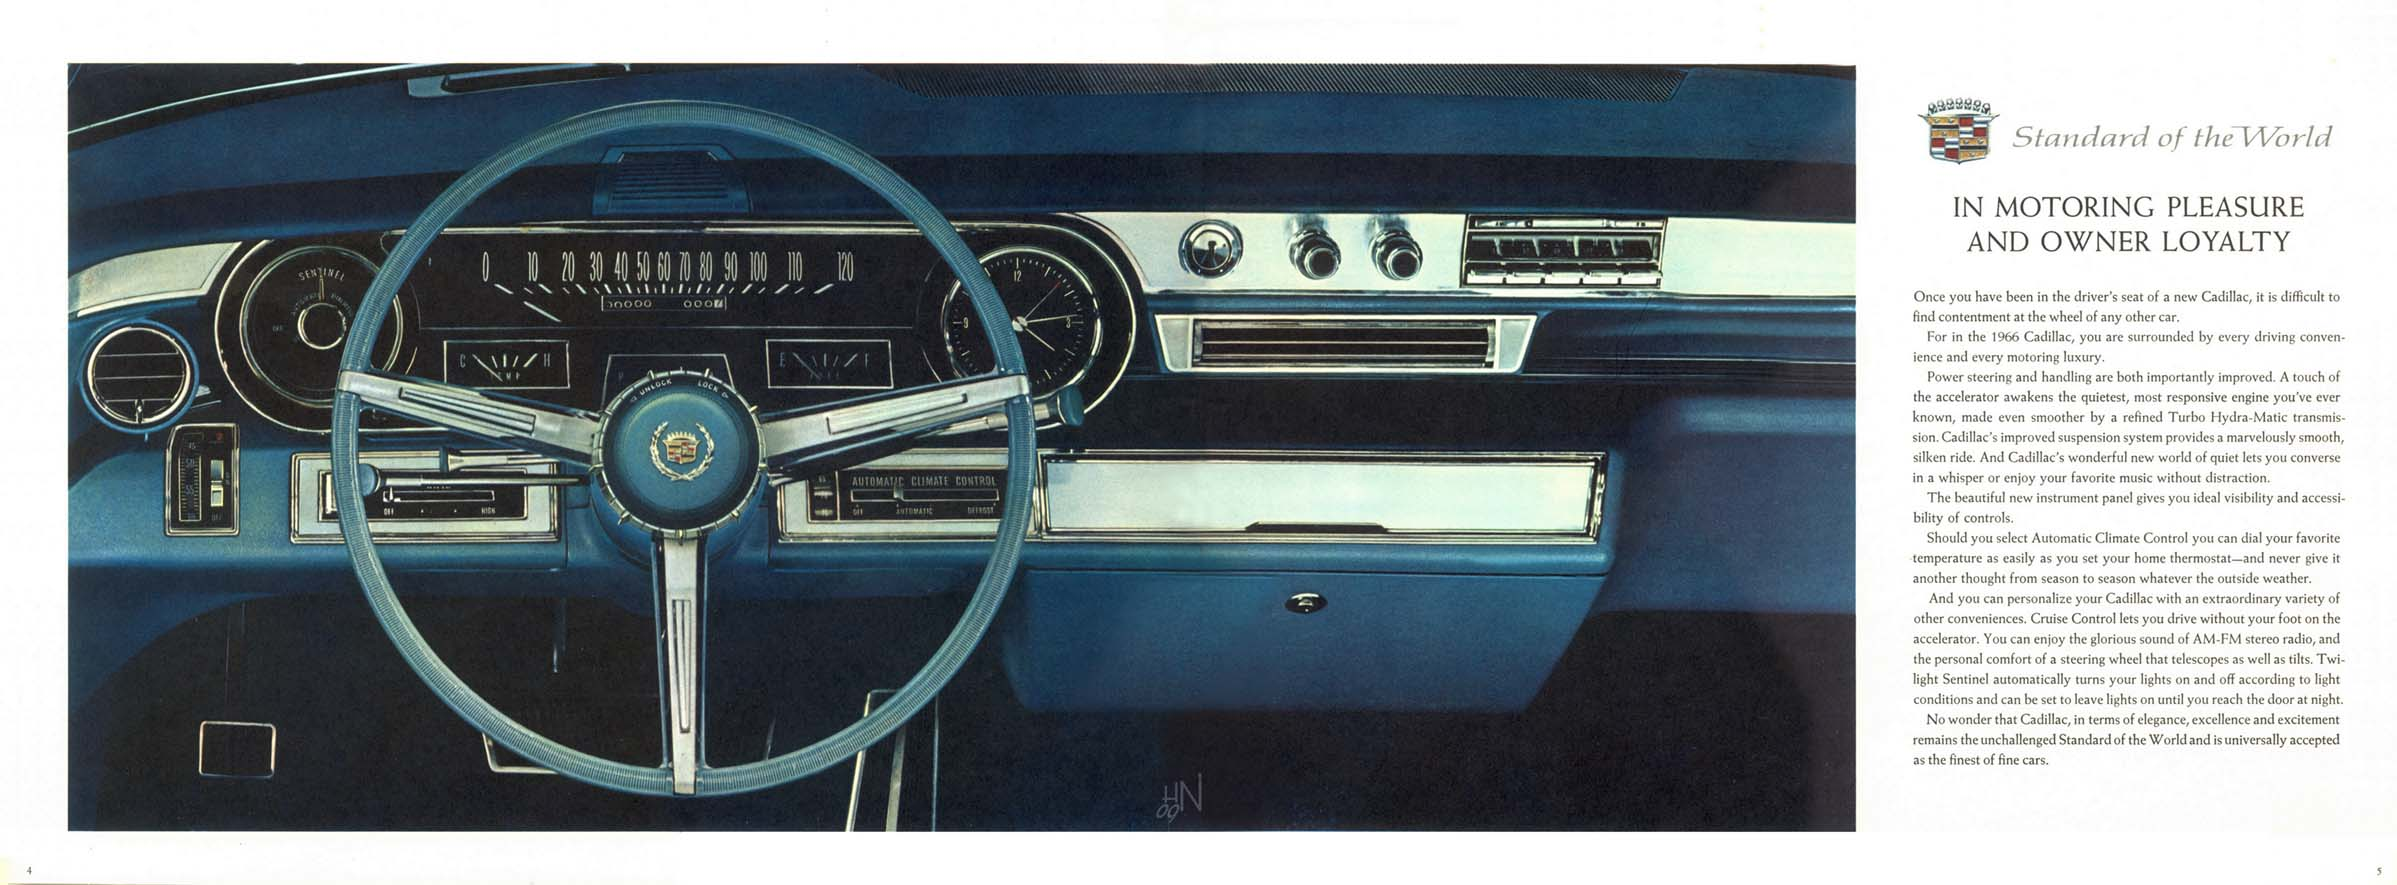 1966 Cadillac brochure